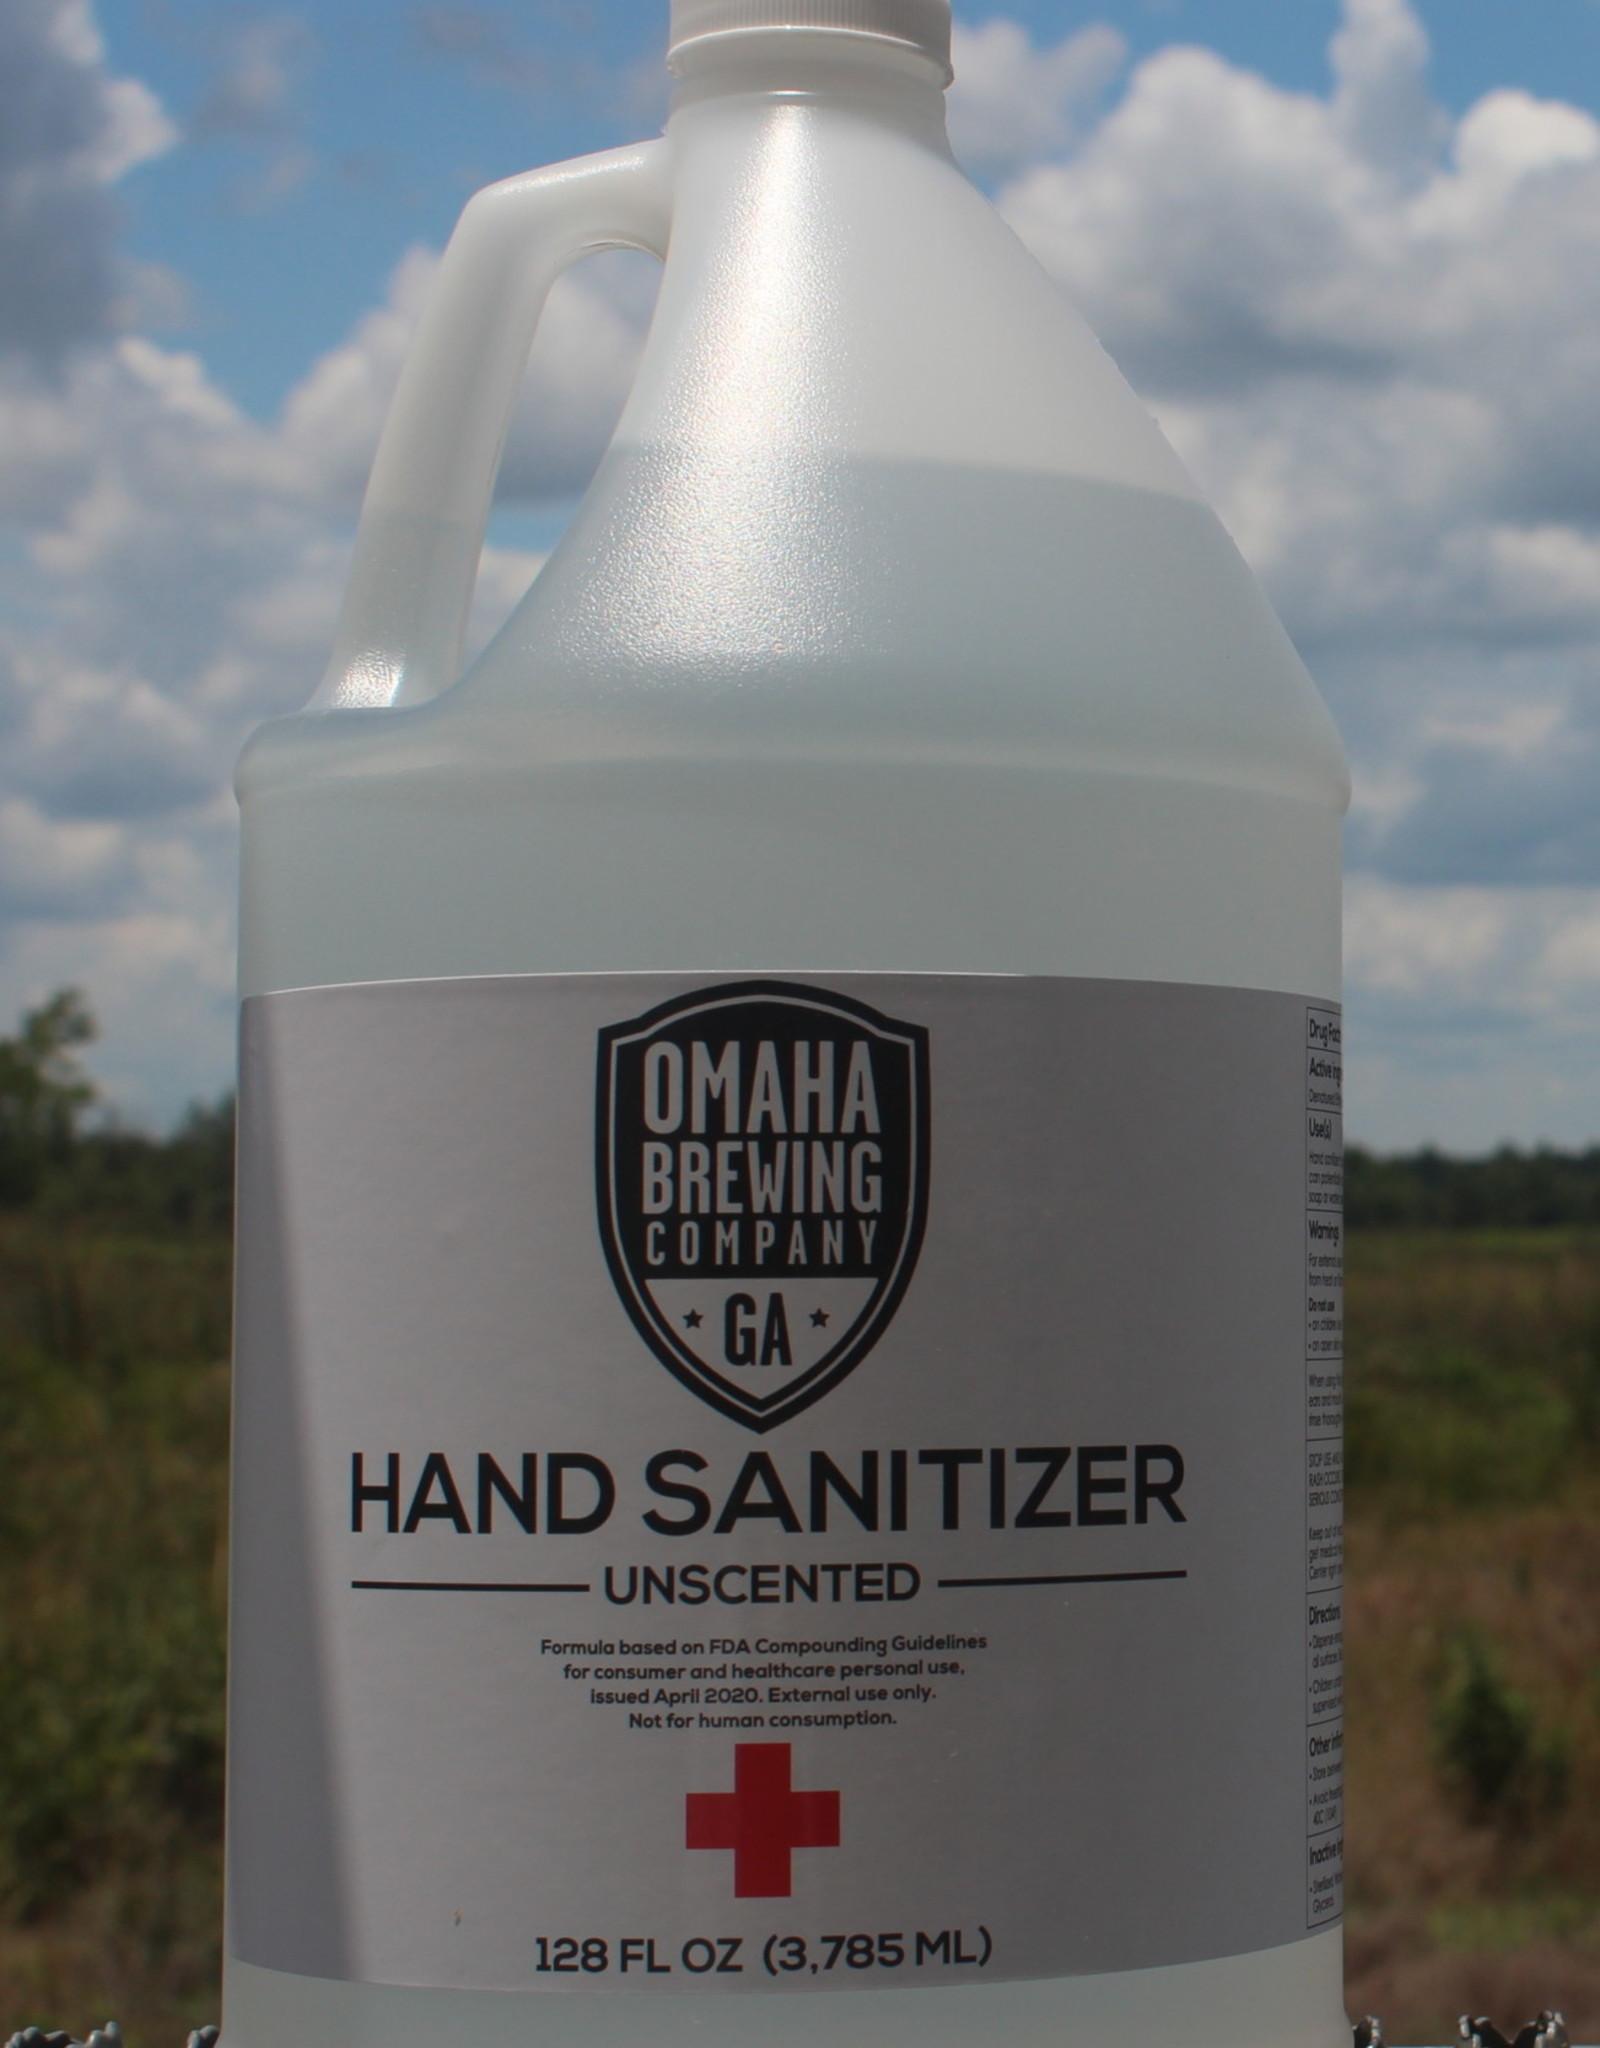 1-Gallon Jug of Hand Sanitizer